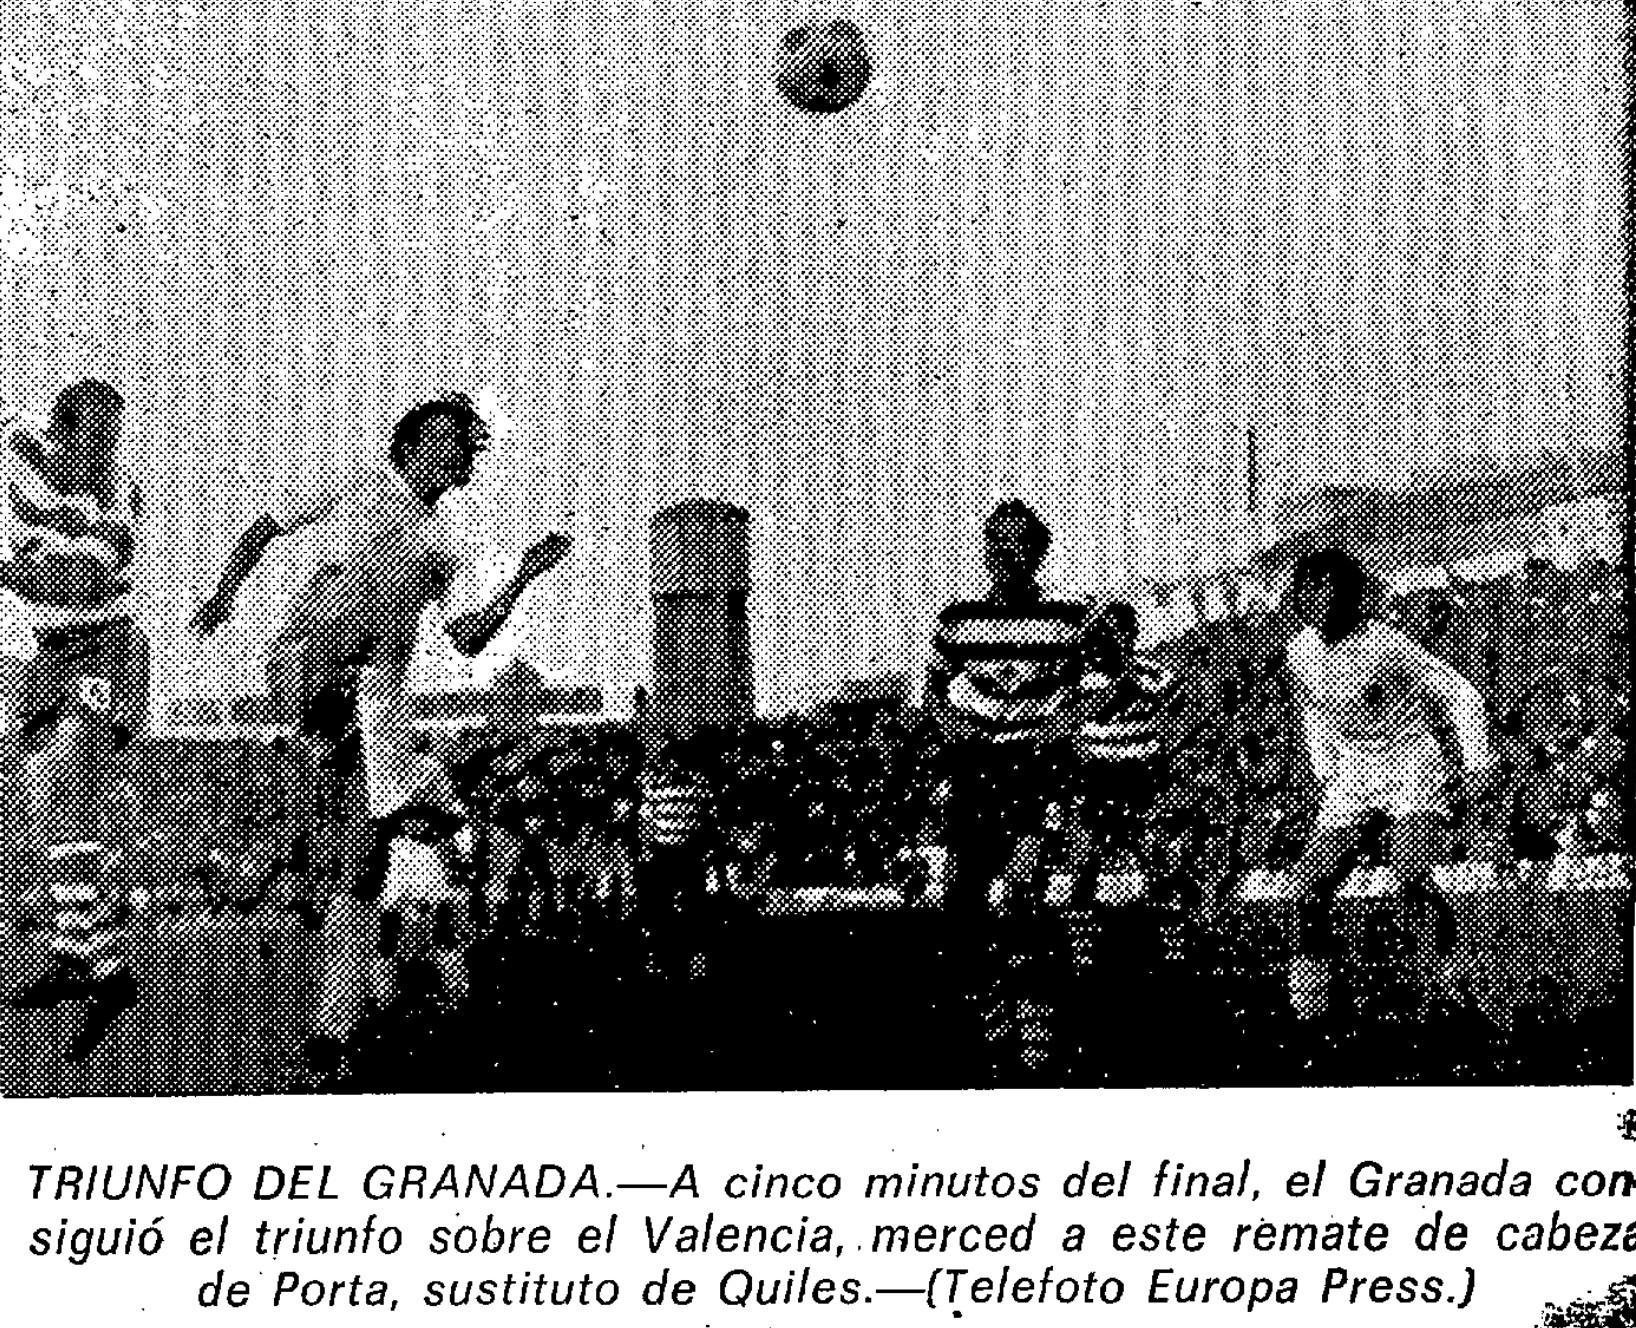 05.01.1975: Granada CF 2 - 1 Valencia CF